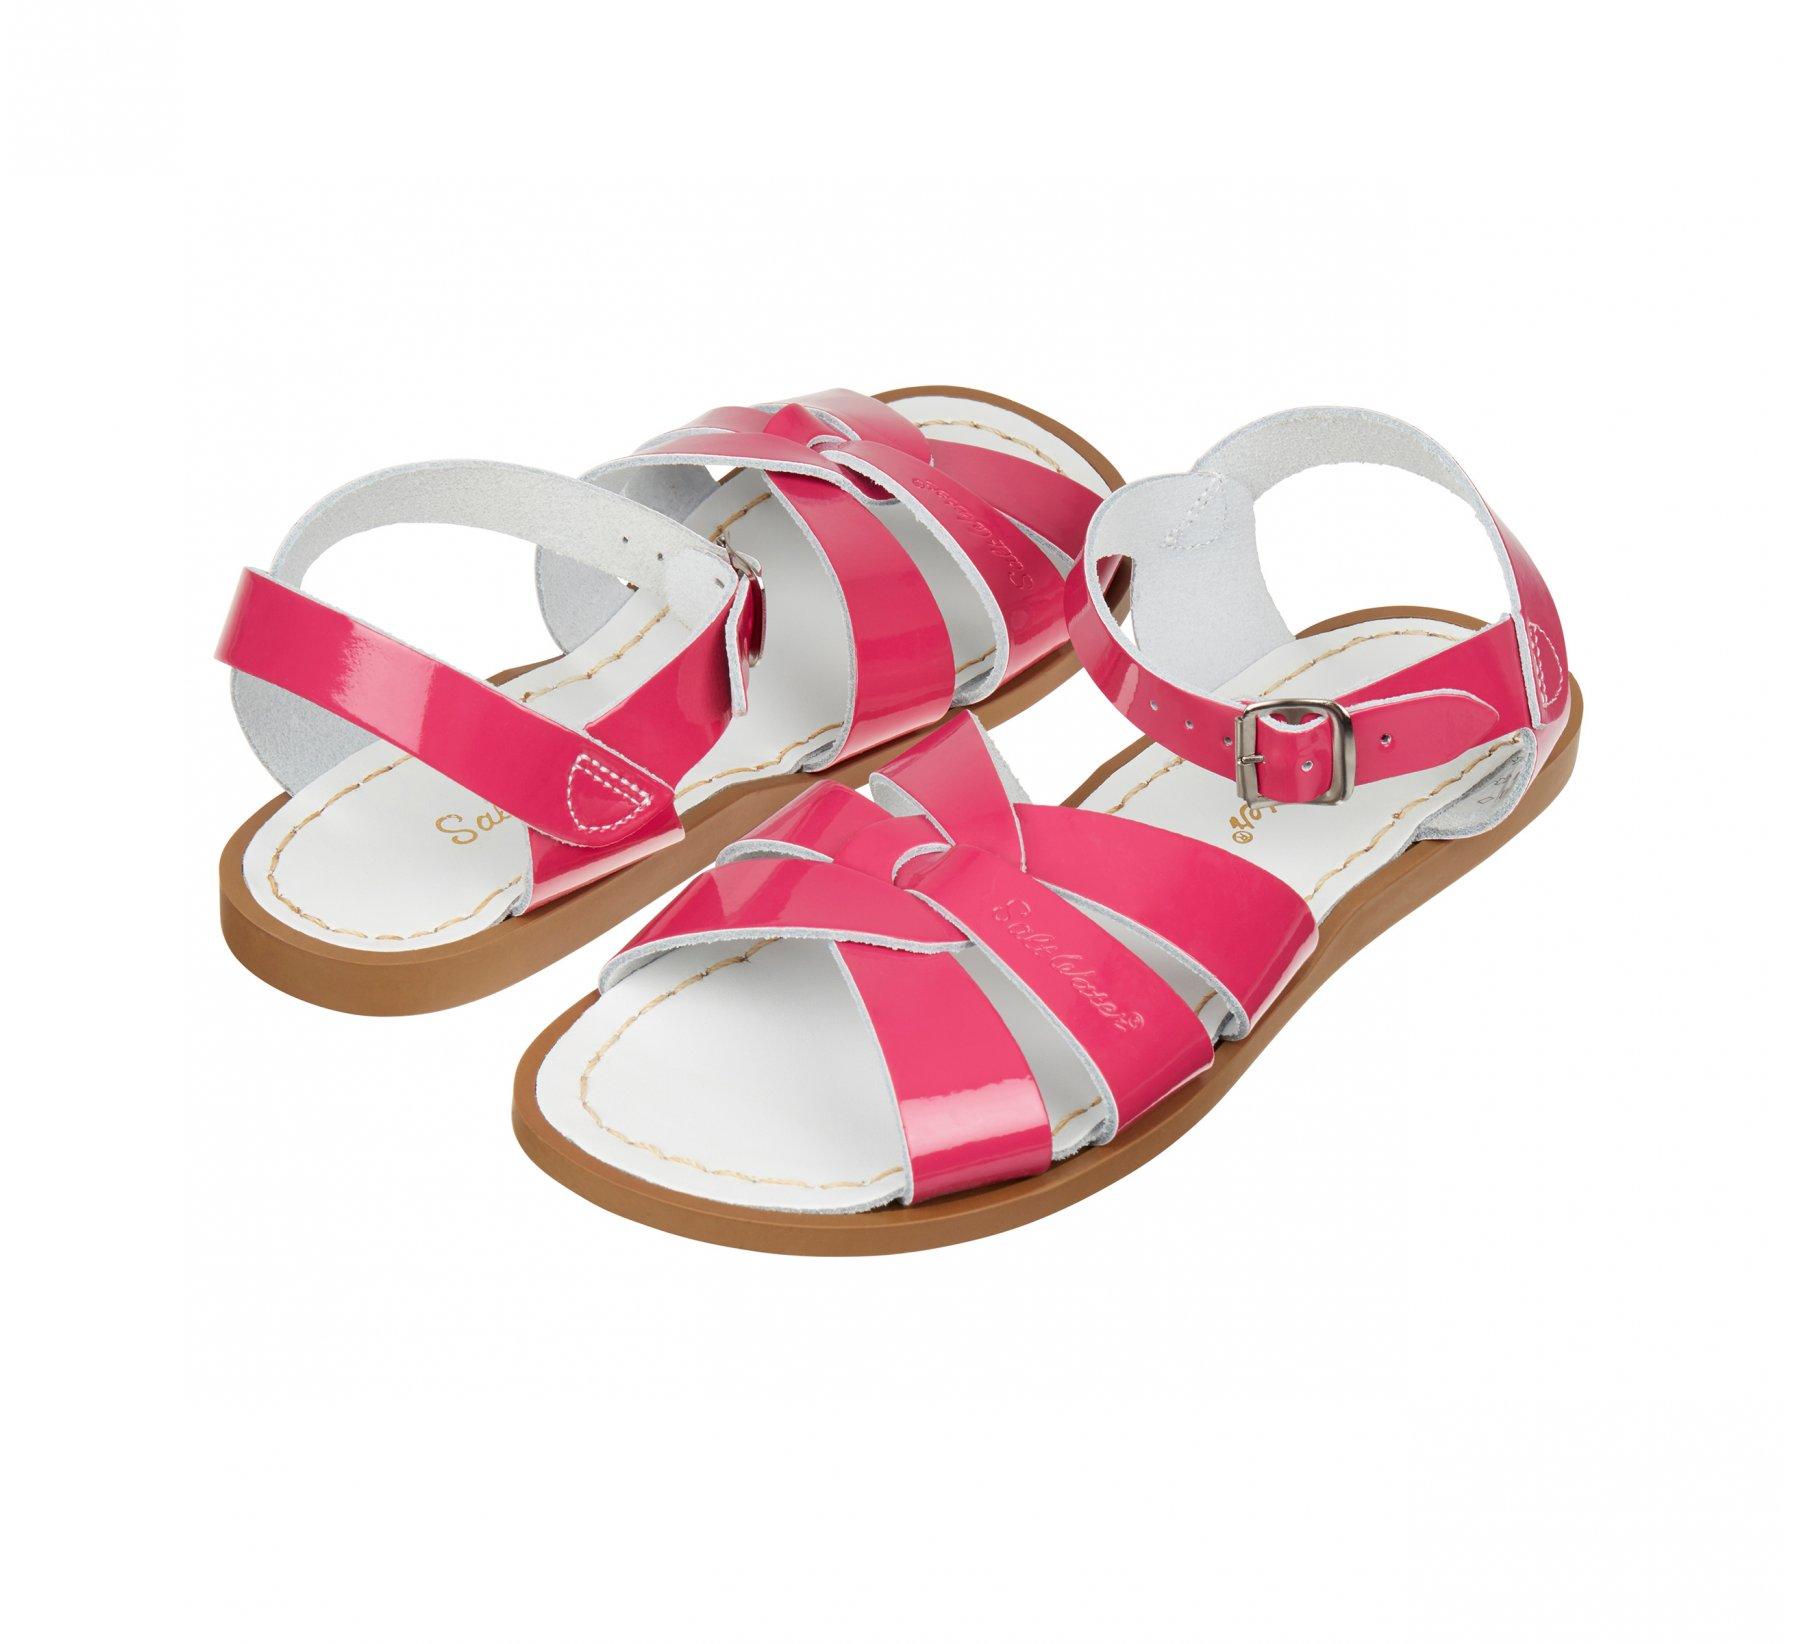 Original Shiny Fuchsia  - Salt Water Sandals